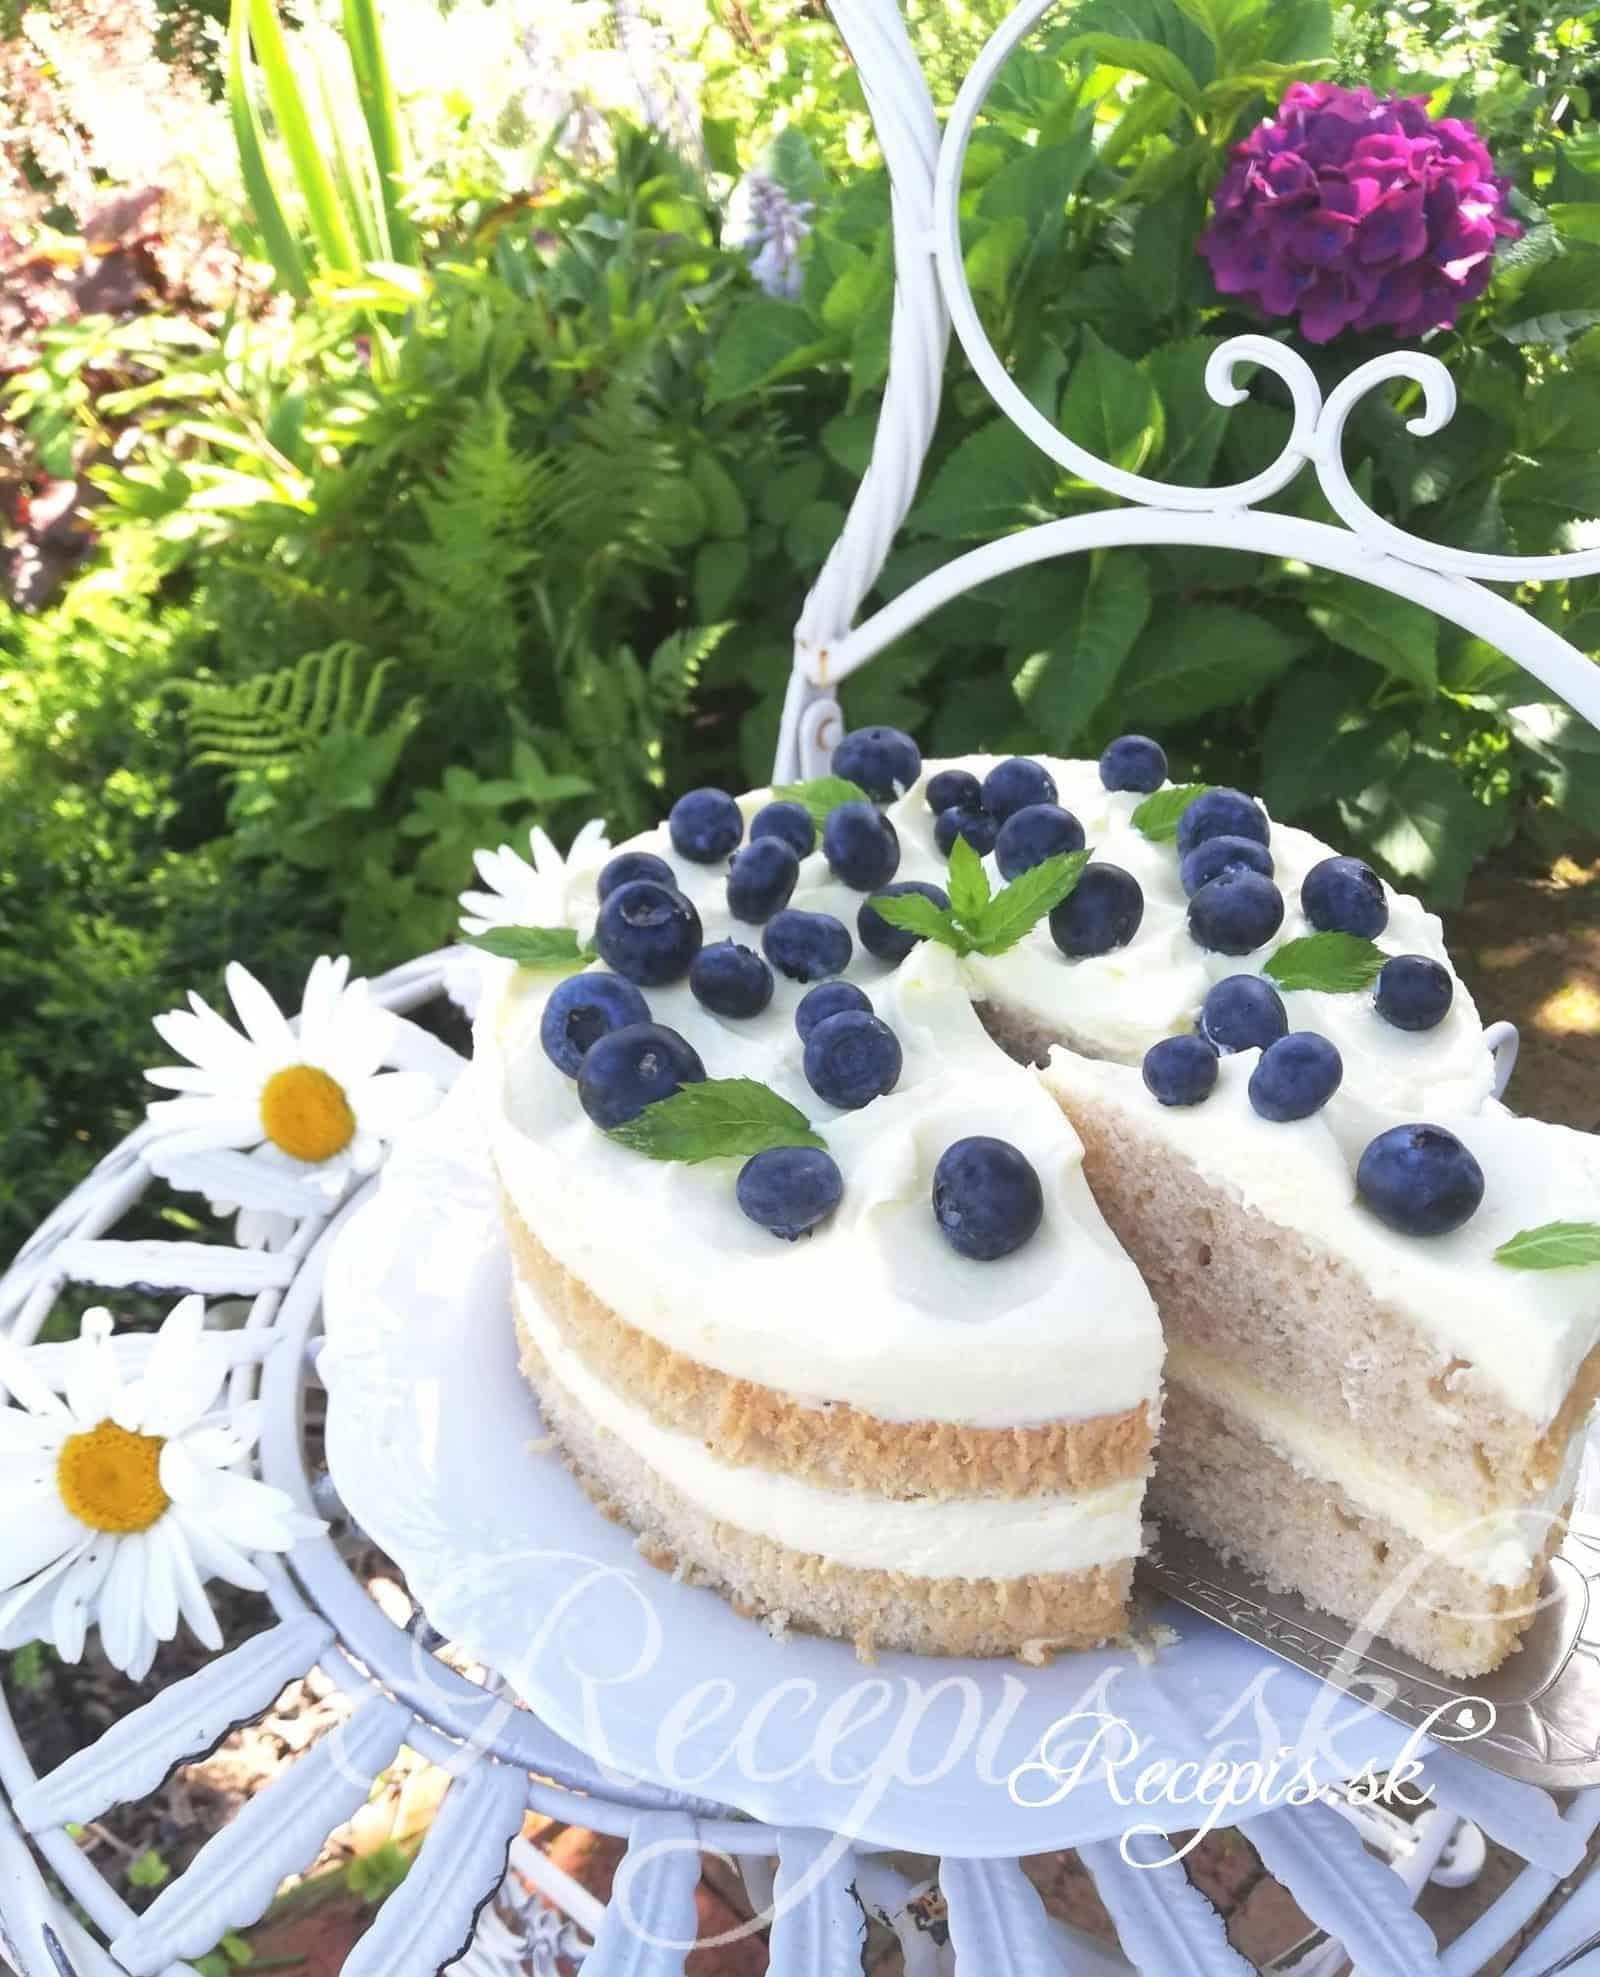 Jednoduchá torta s citrónovou plnkou